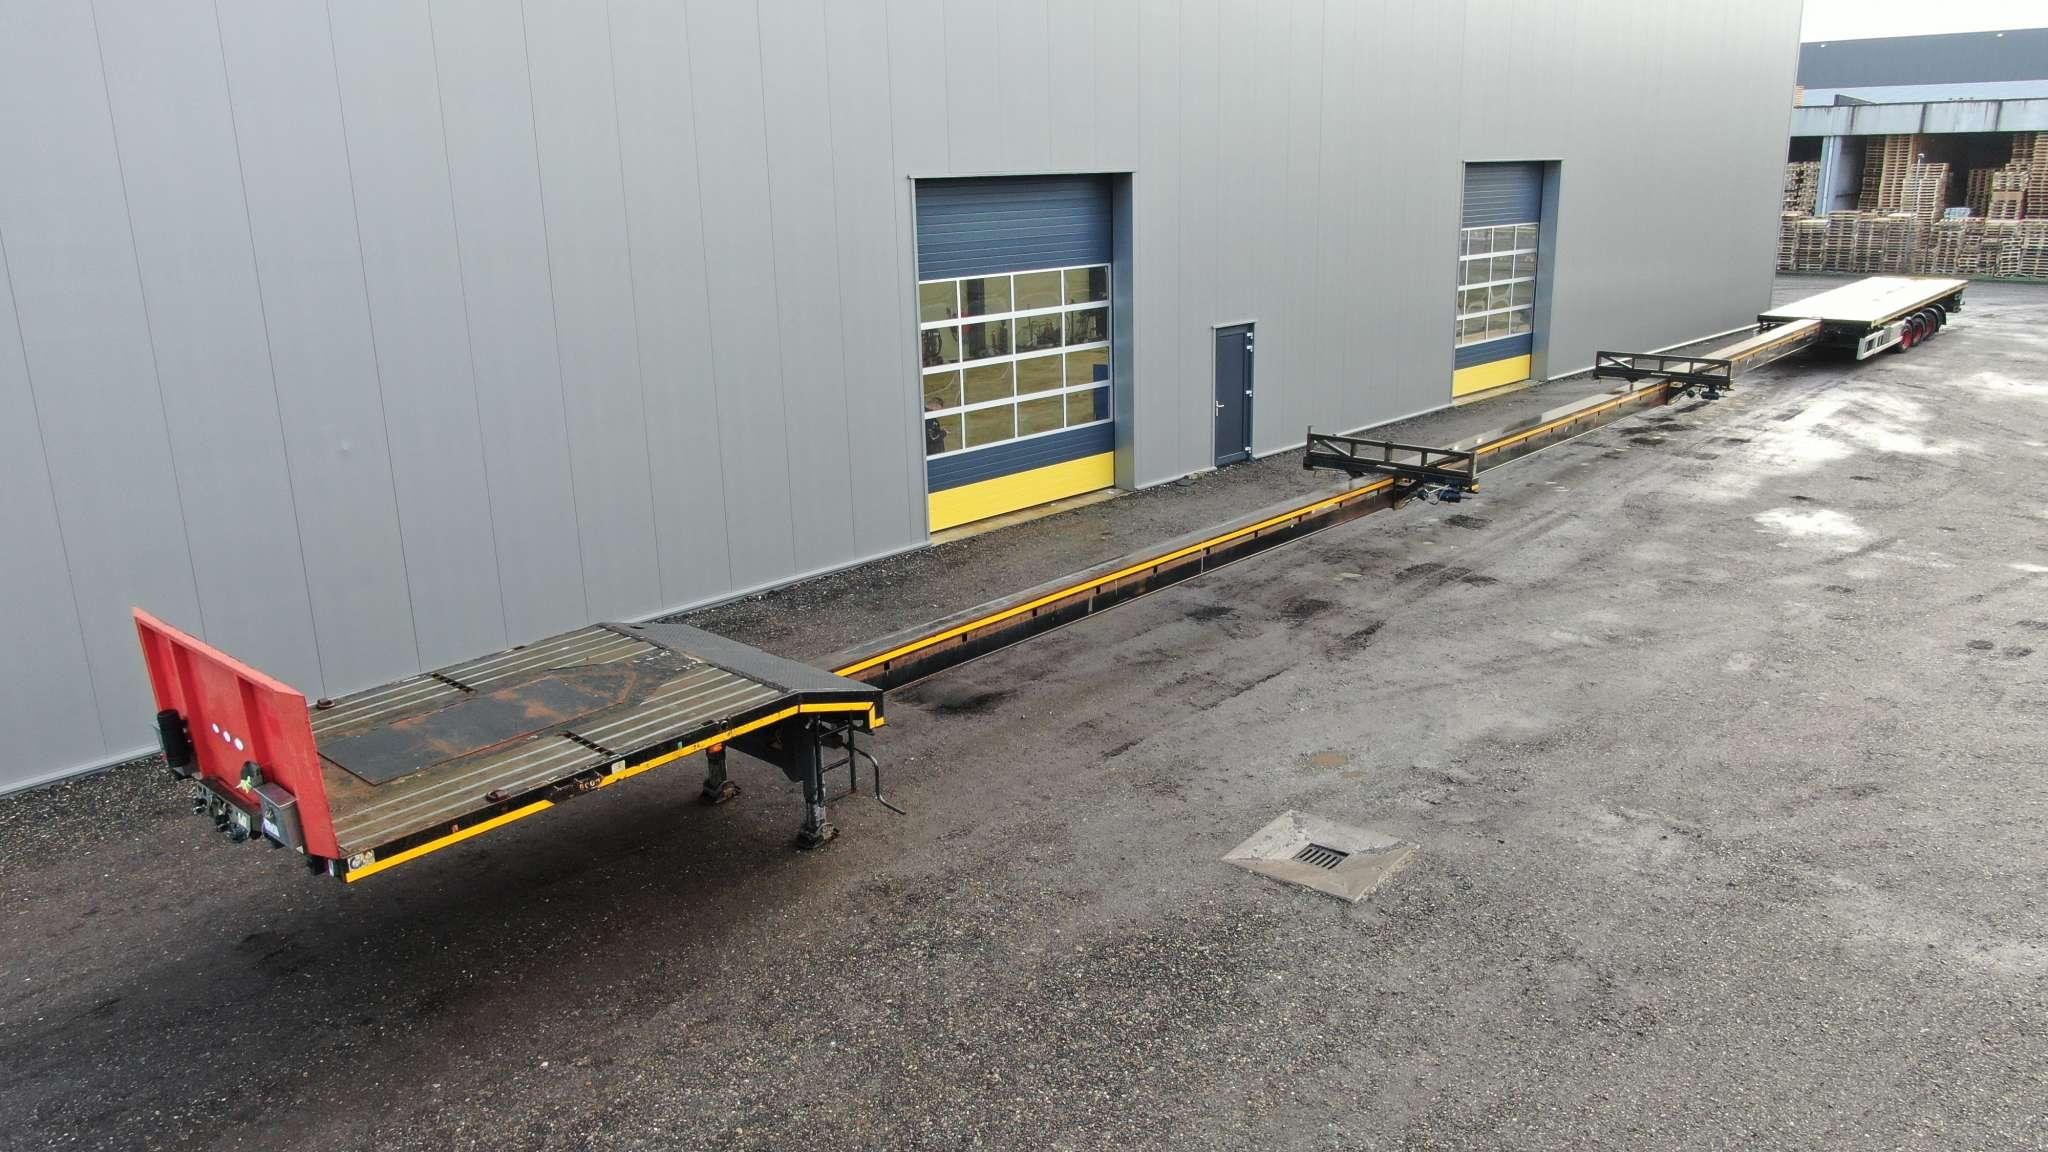 4 Axle telestep | 3x extendable till 48 m | payload 47 ton